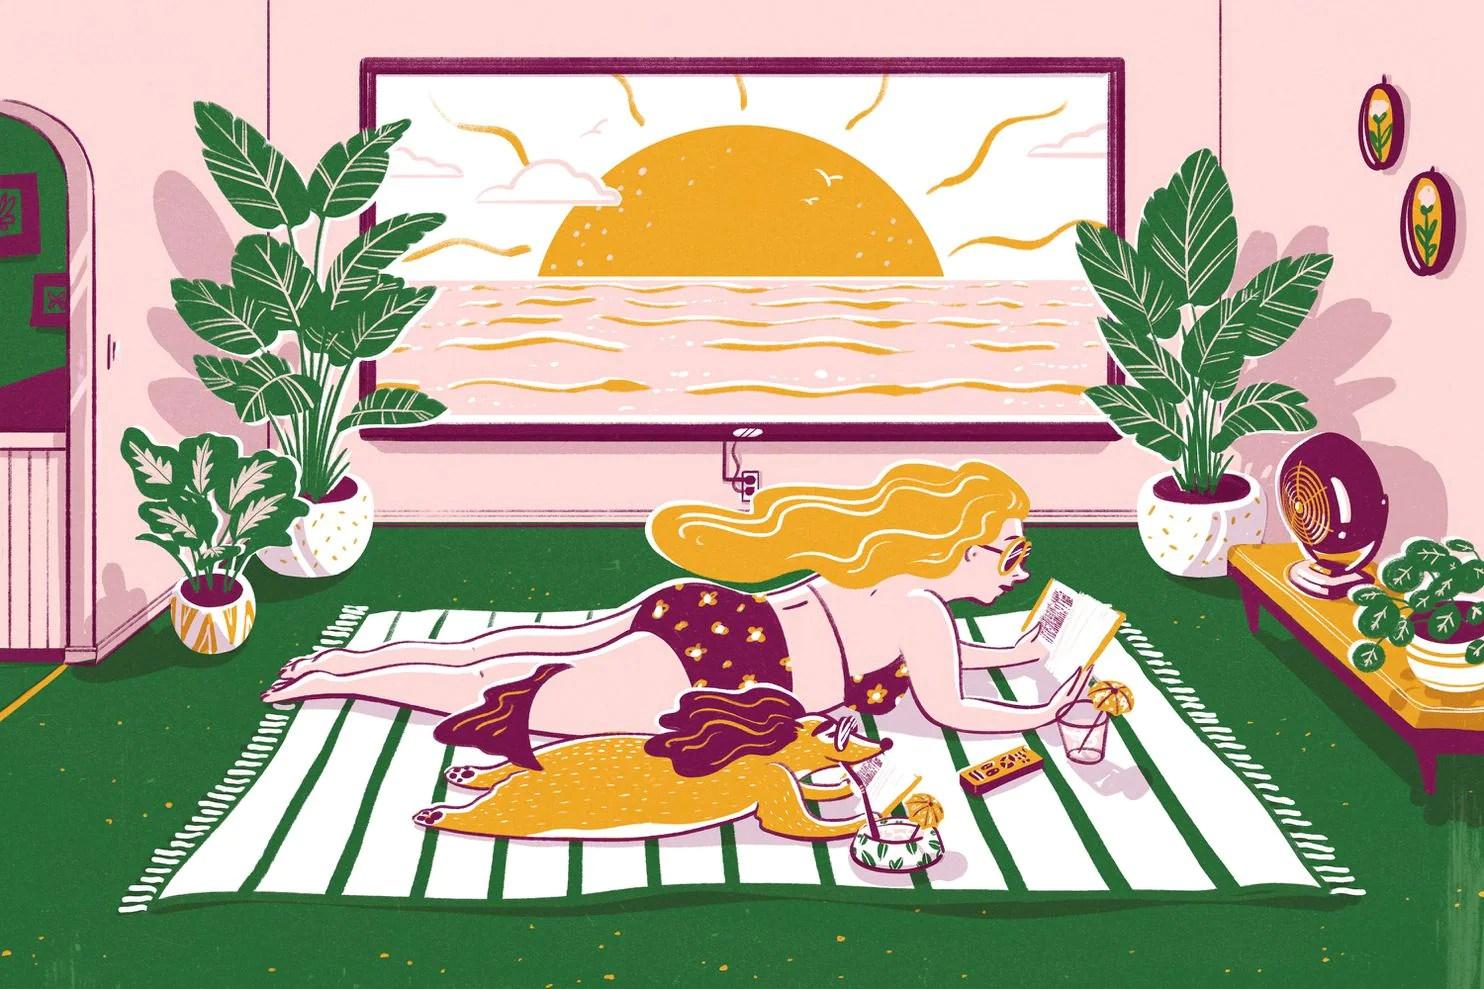 How To Vacation At Home While Social Distancing During Coronavirus The Washington Post